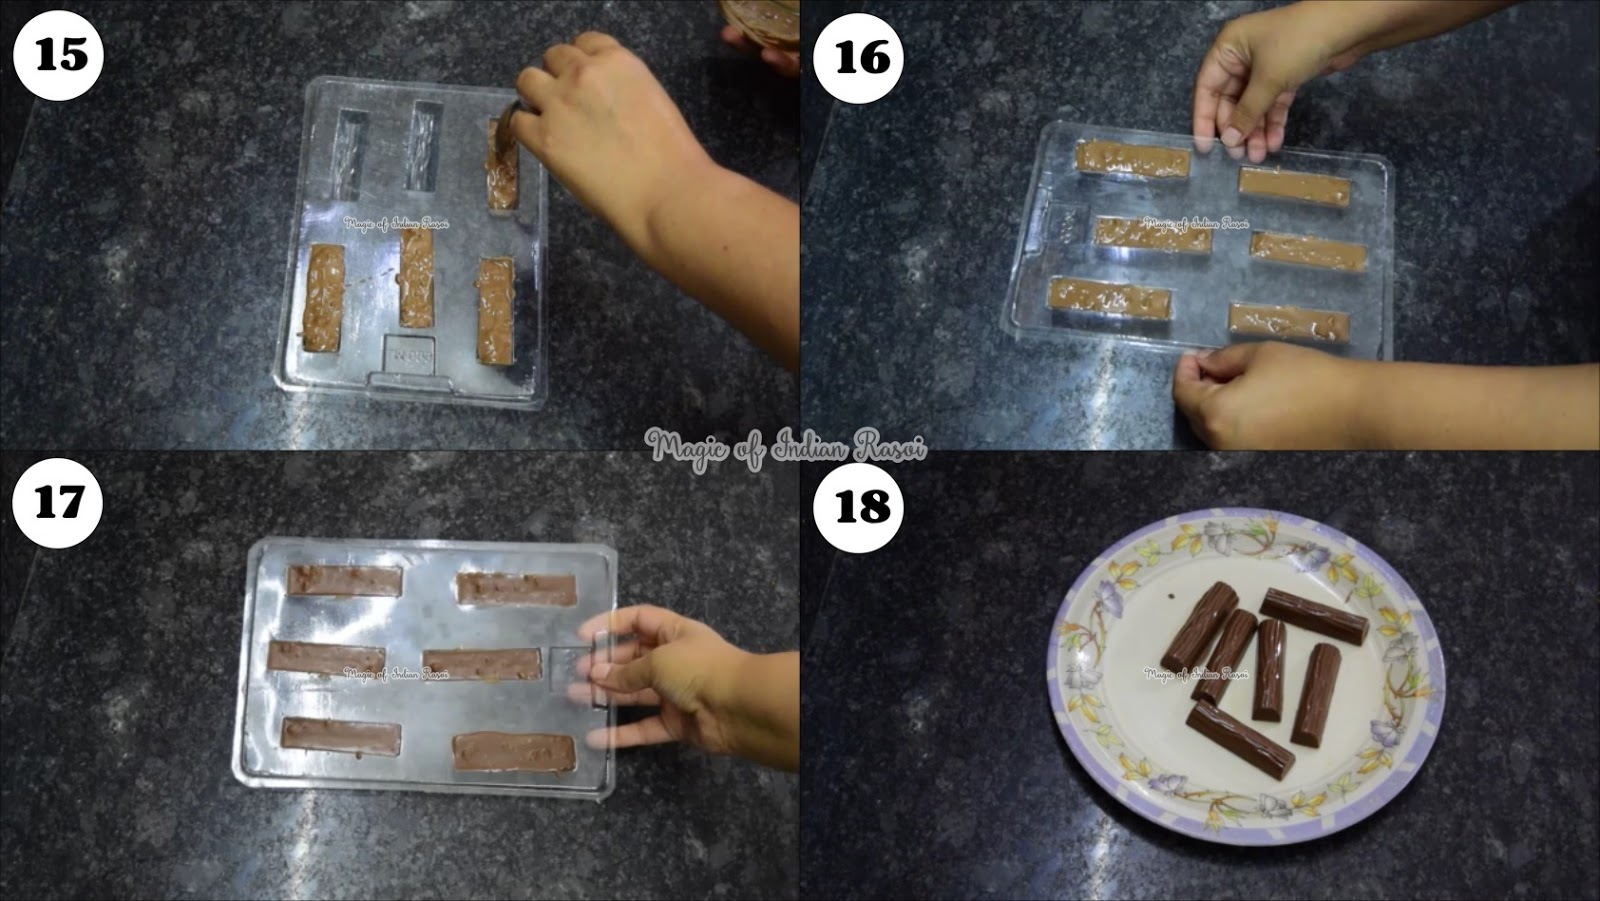 Crunchy Honey and Almonds Chocolate (Homemade) Recipe - कुरकुरे हनी और बादाम चॉकलेट (घर बनाया) रेसिपी - Priya R - Magic of Indian Rasoi